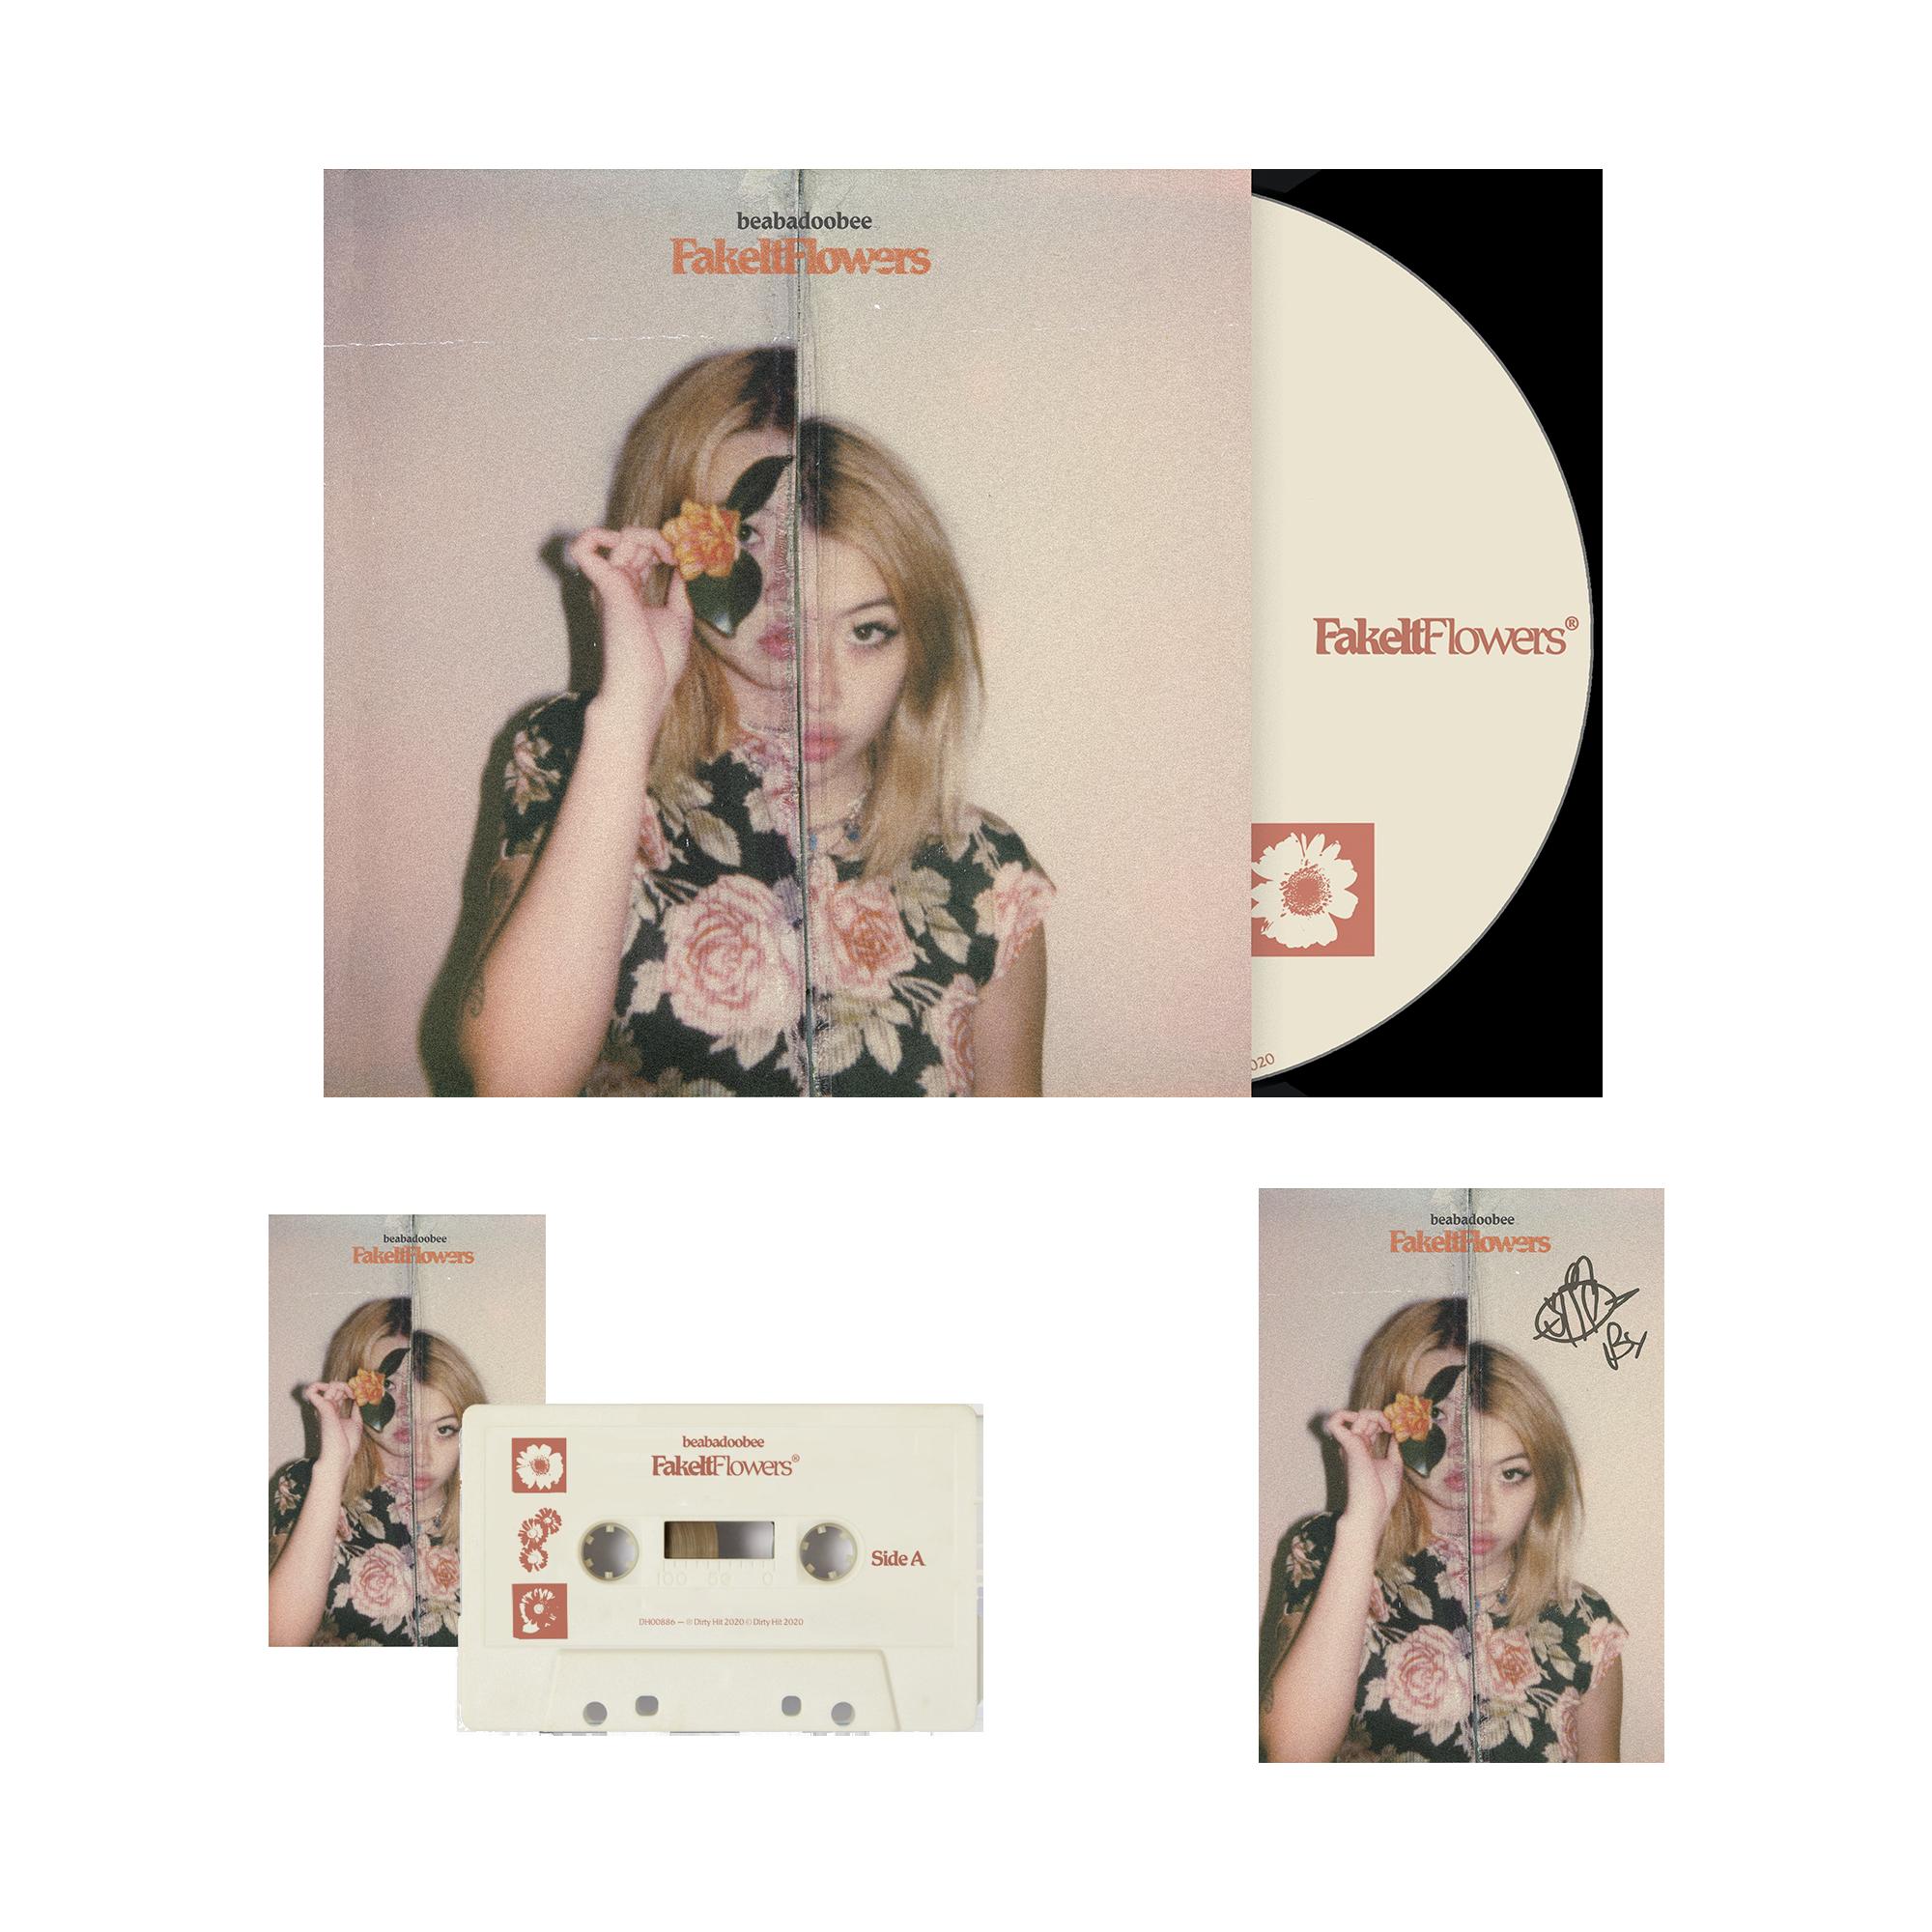 Beabadoobee: Fake It Flowers Magnolia CD Bundle (Signed)